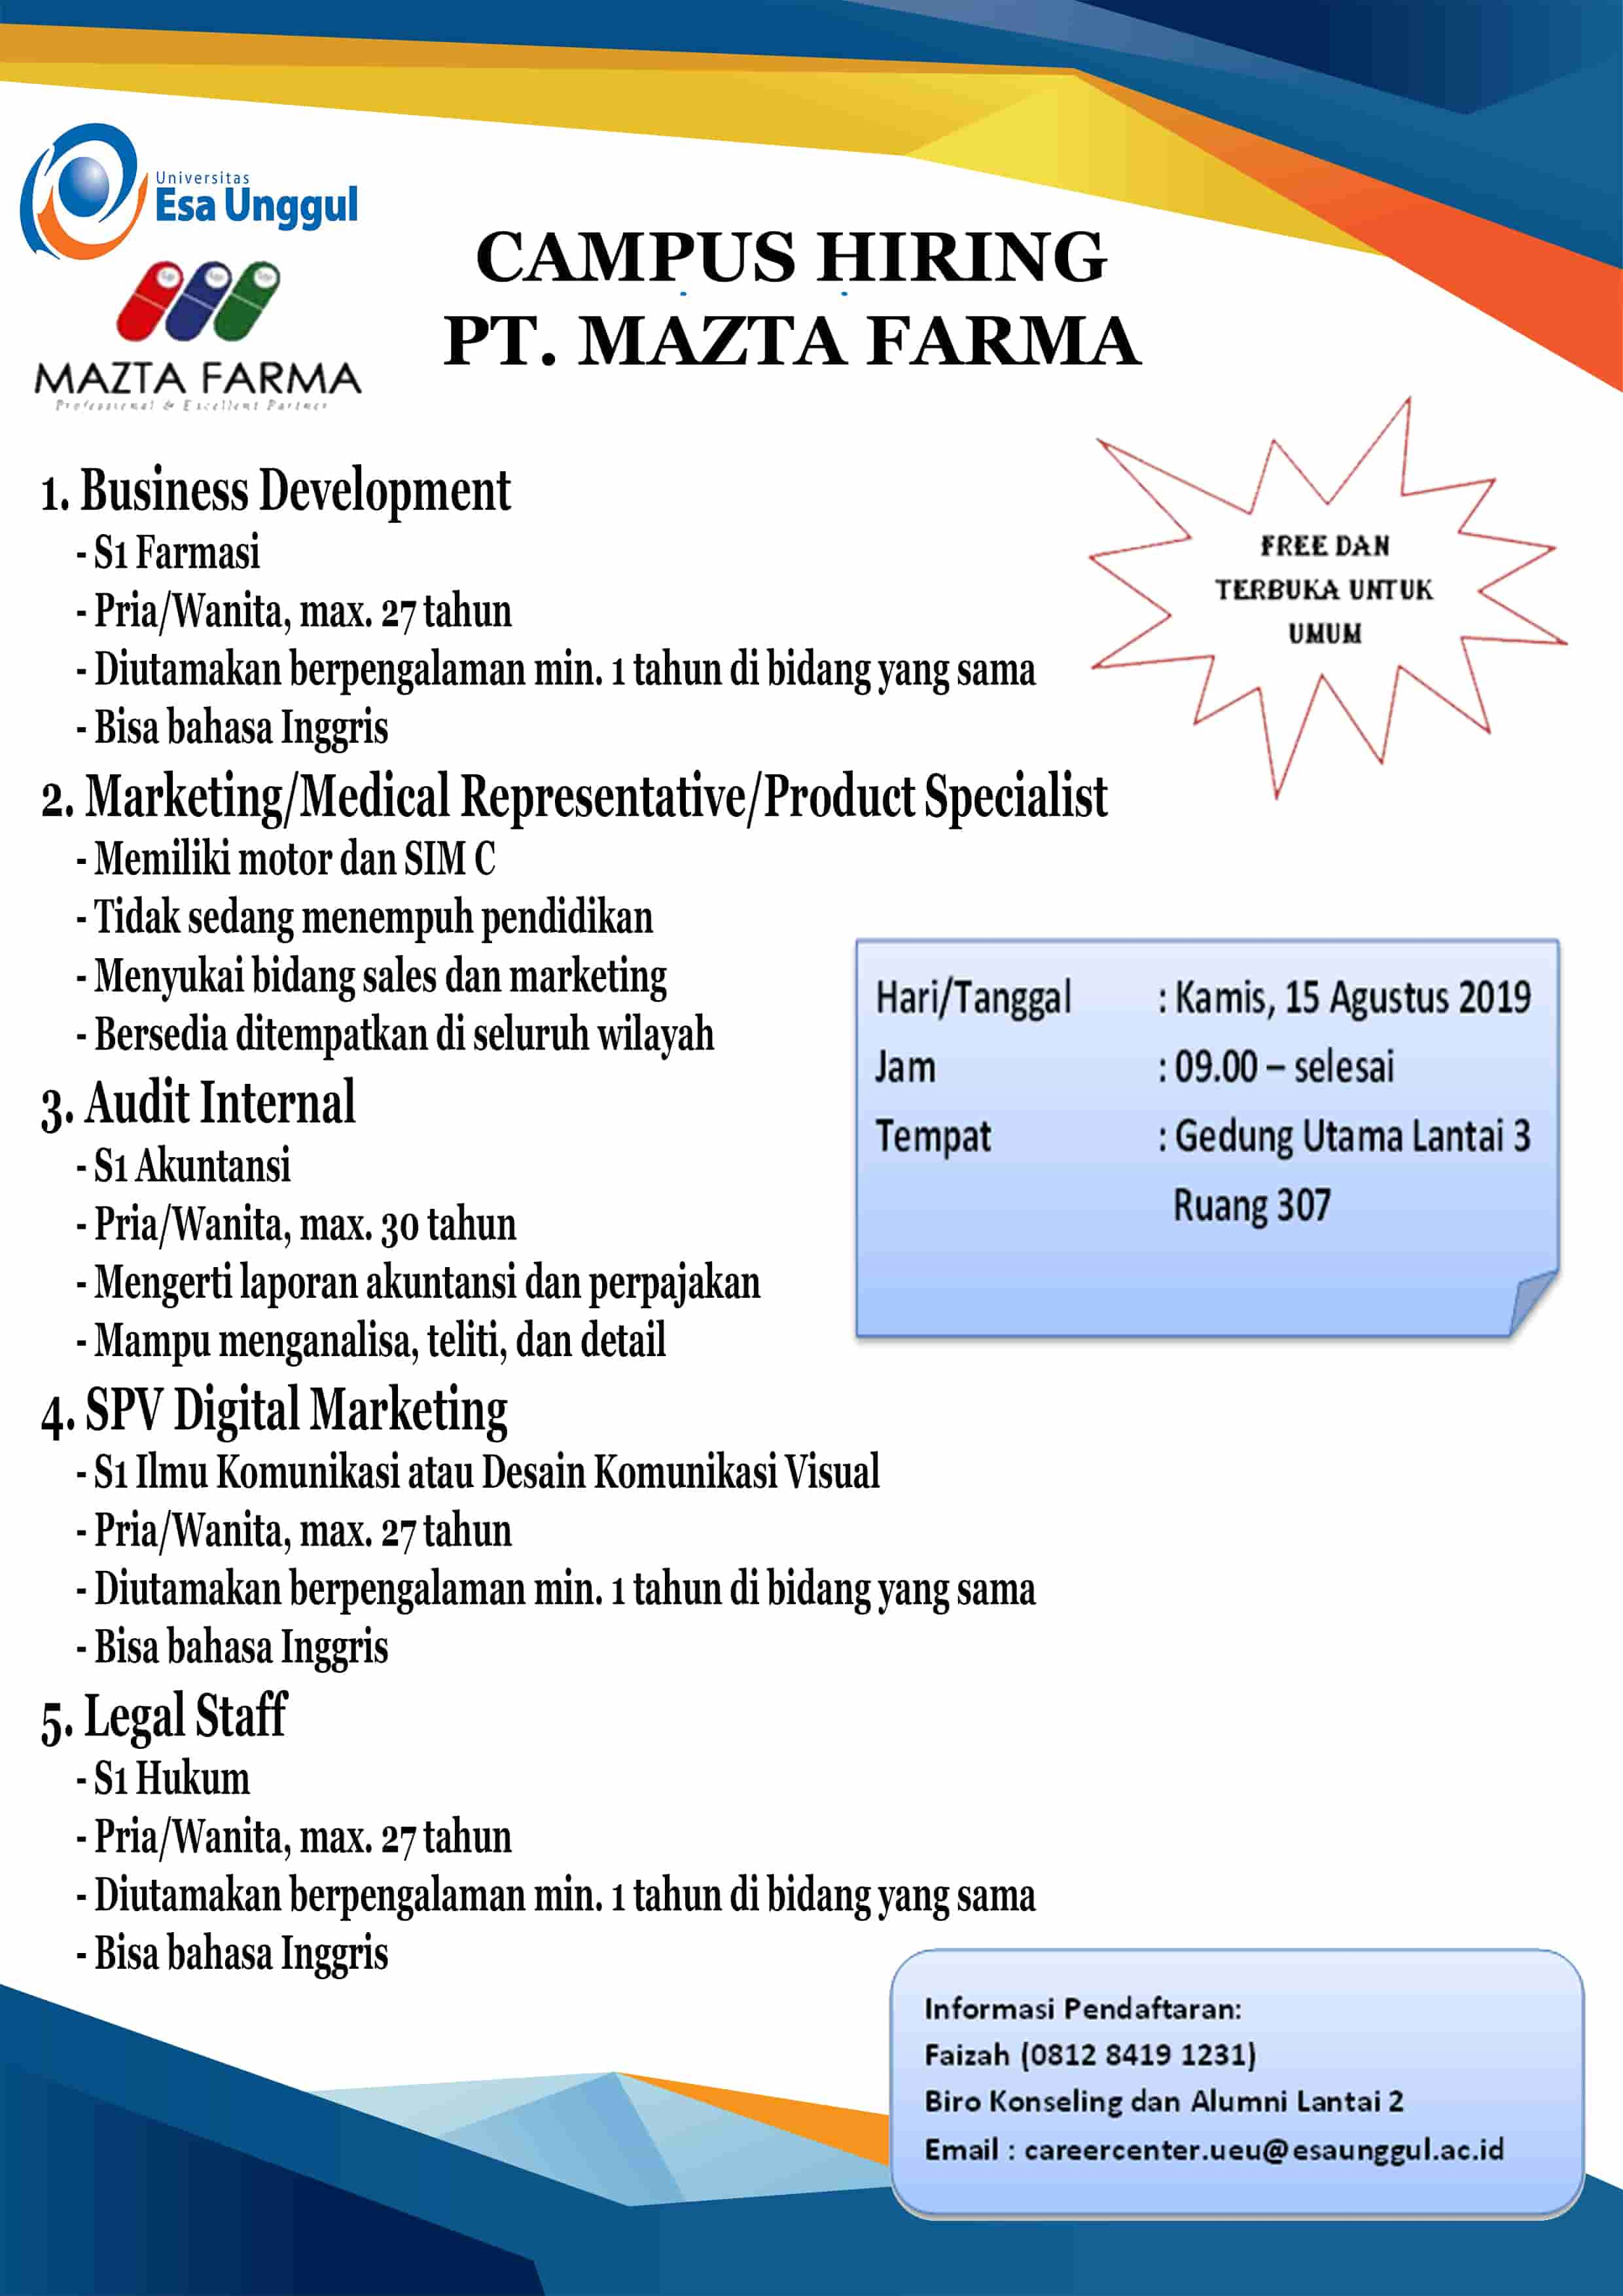 Campus Hiring PT. MAZTA FARMA